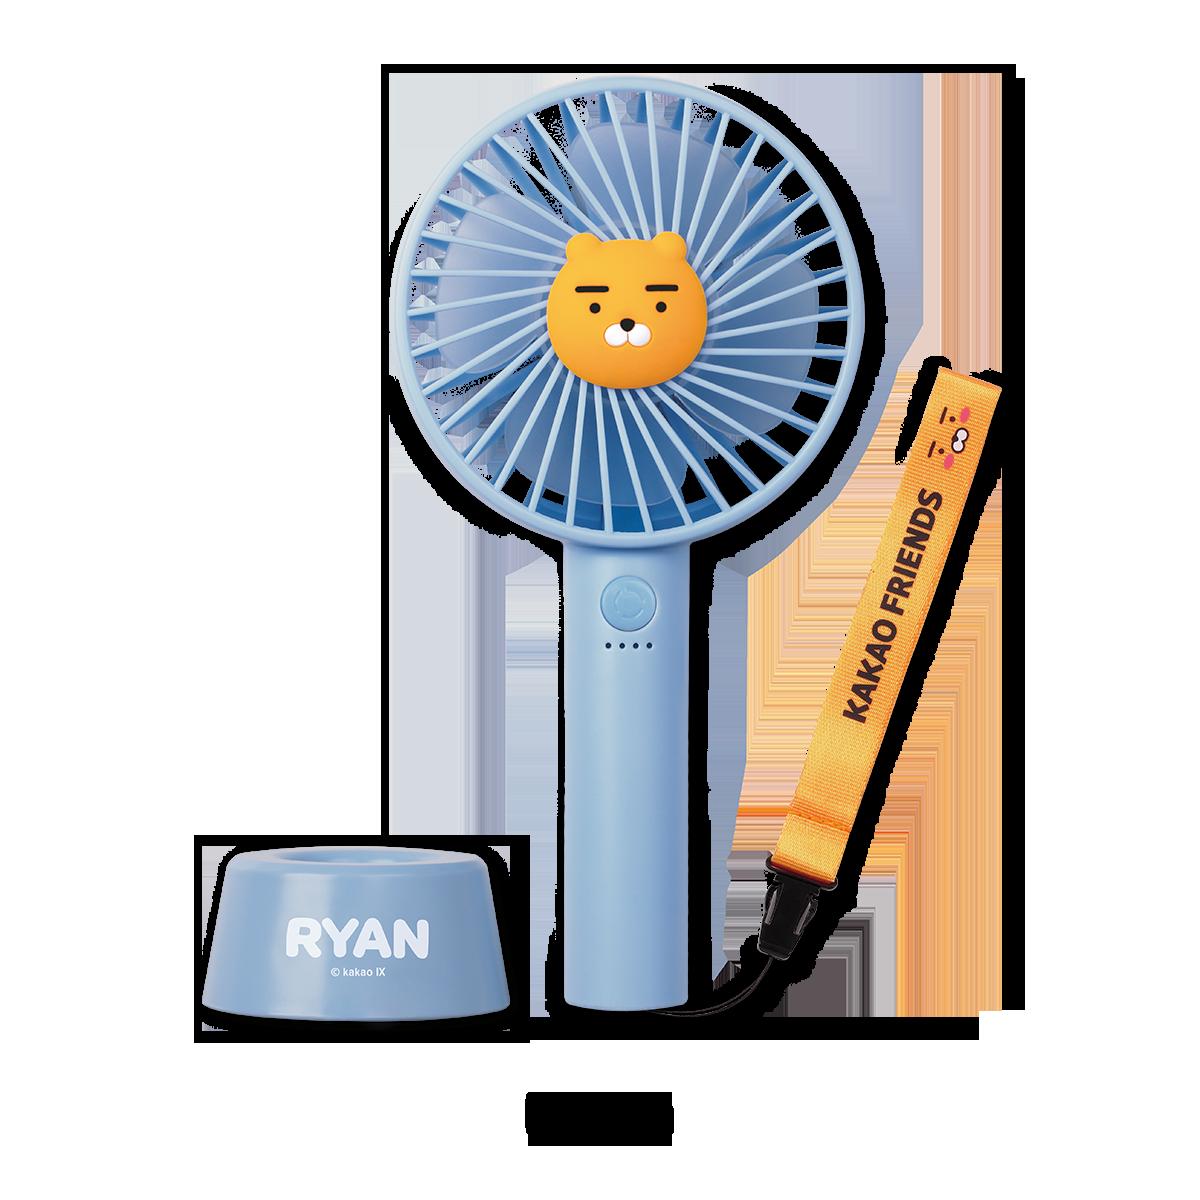 Ryan手持風扇